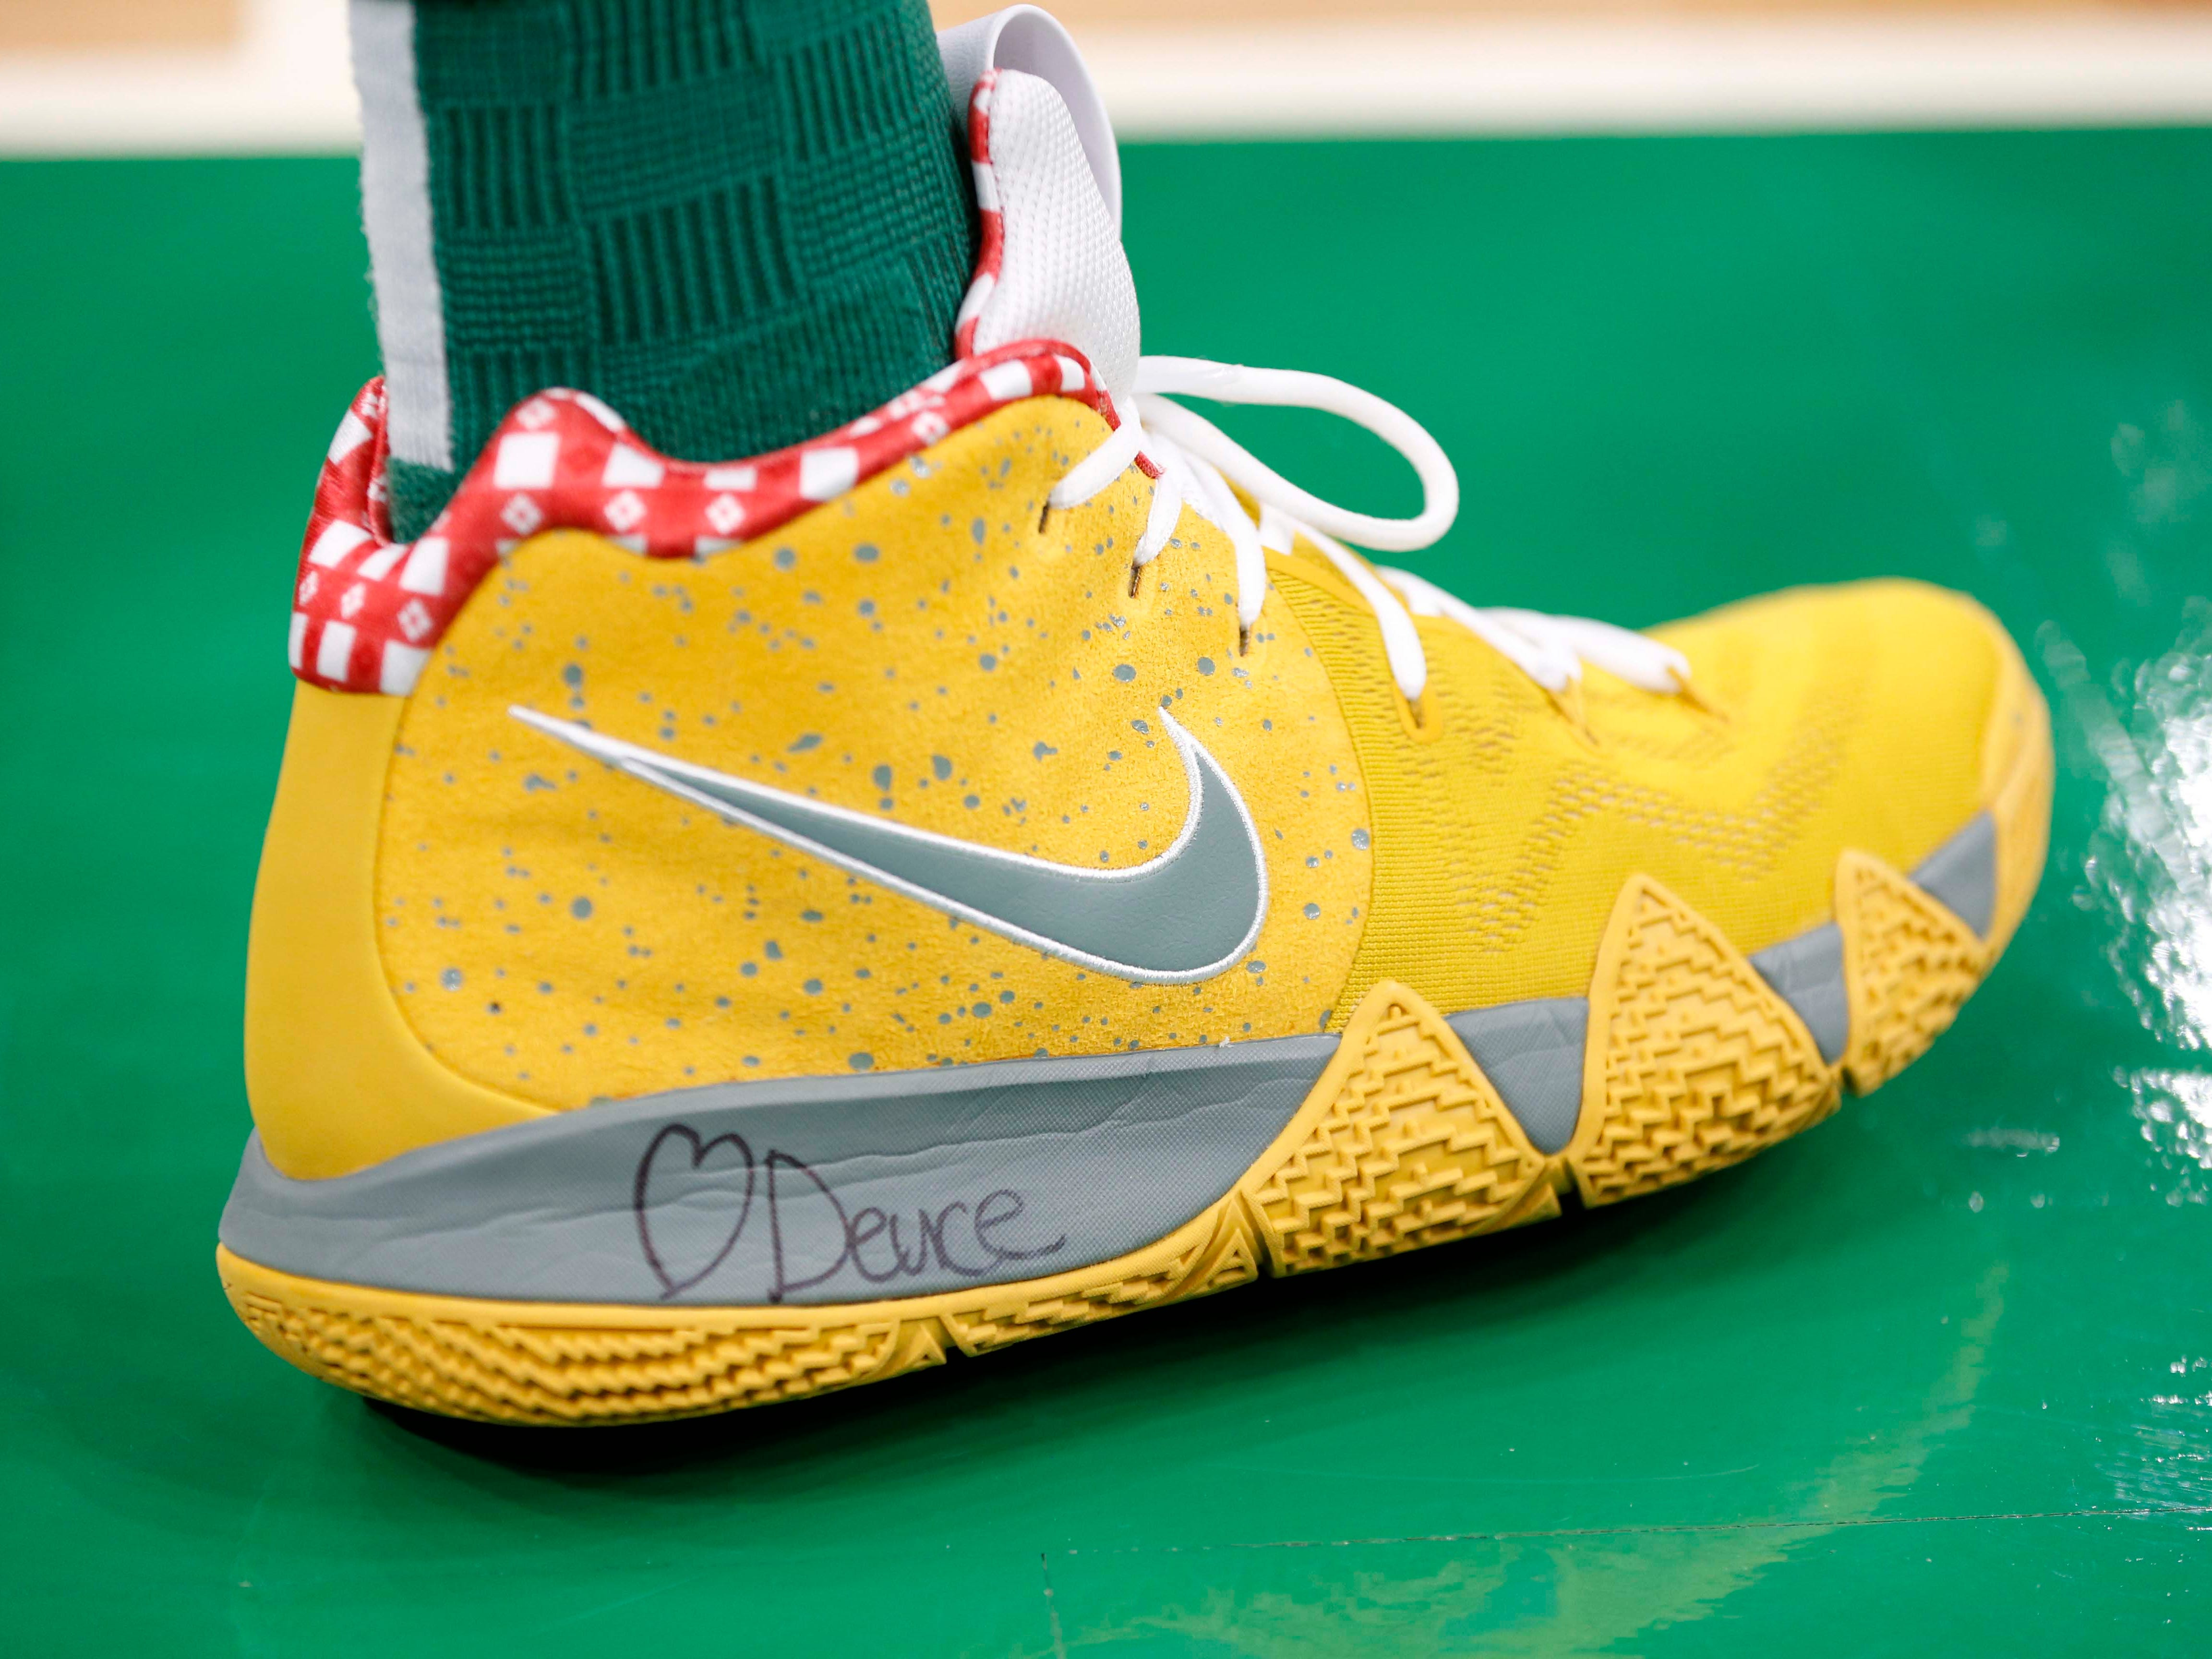 Dec. 6: Jayson Tatum, Celtics